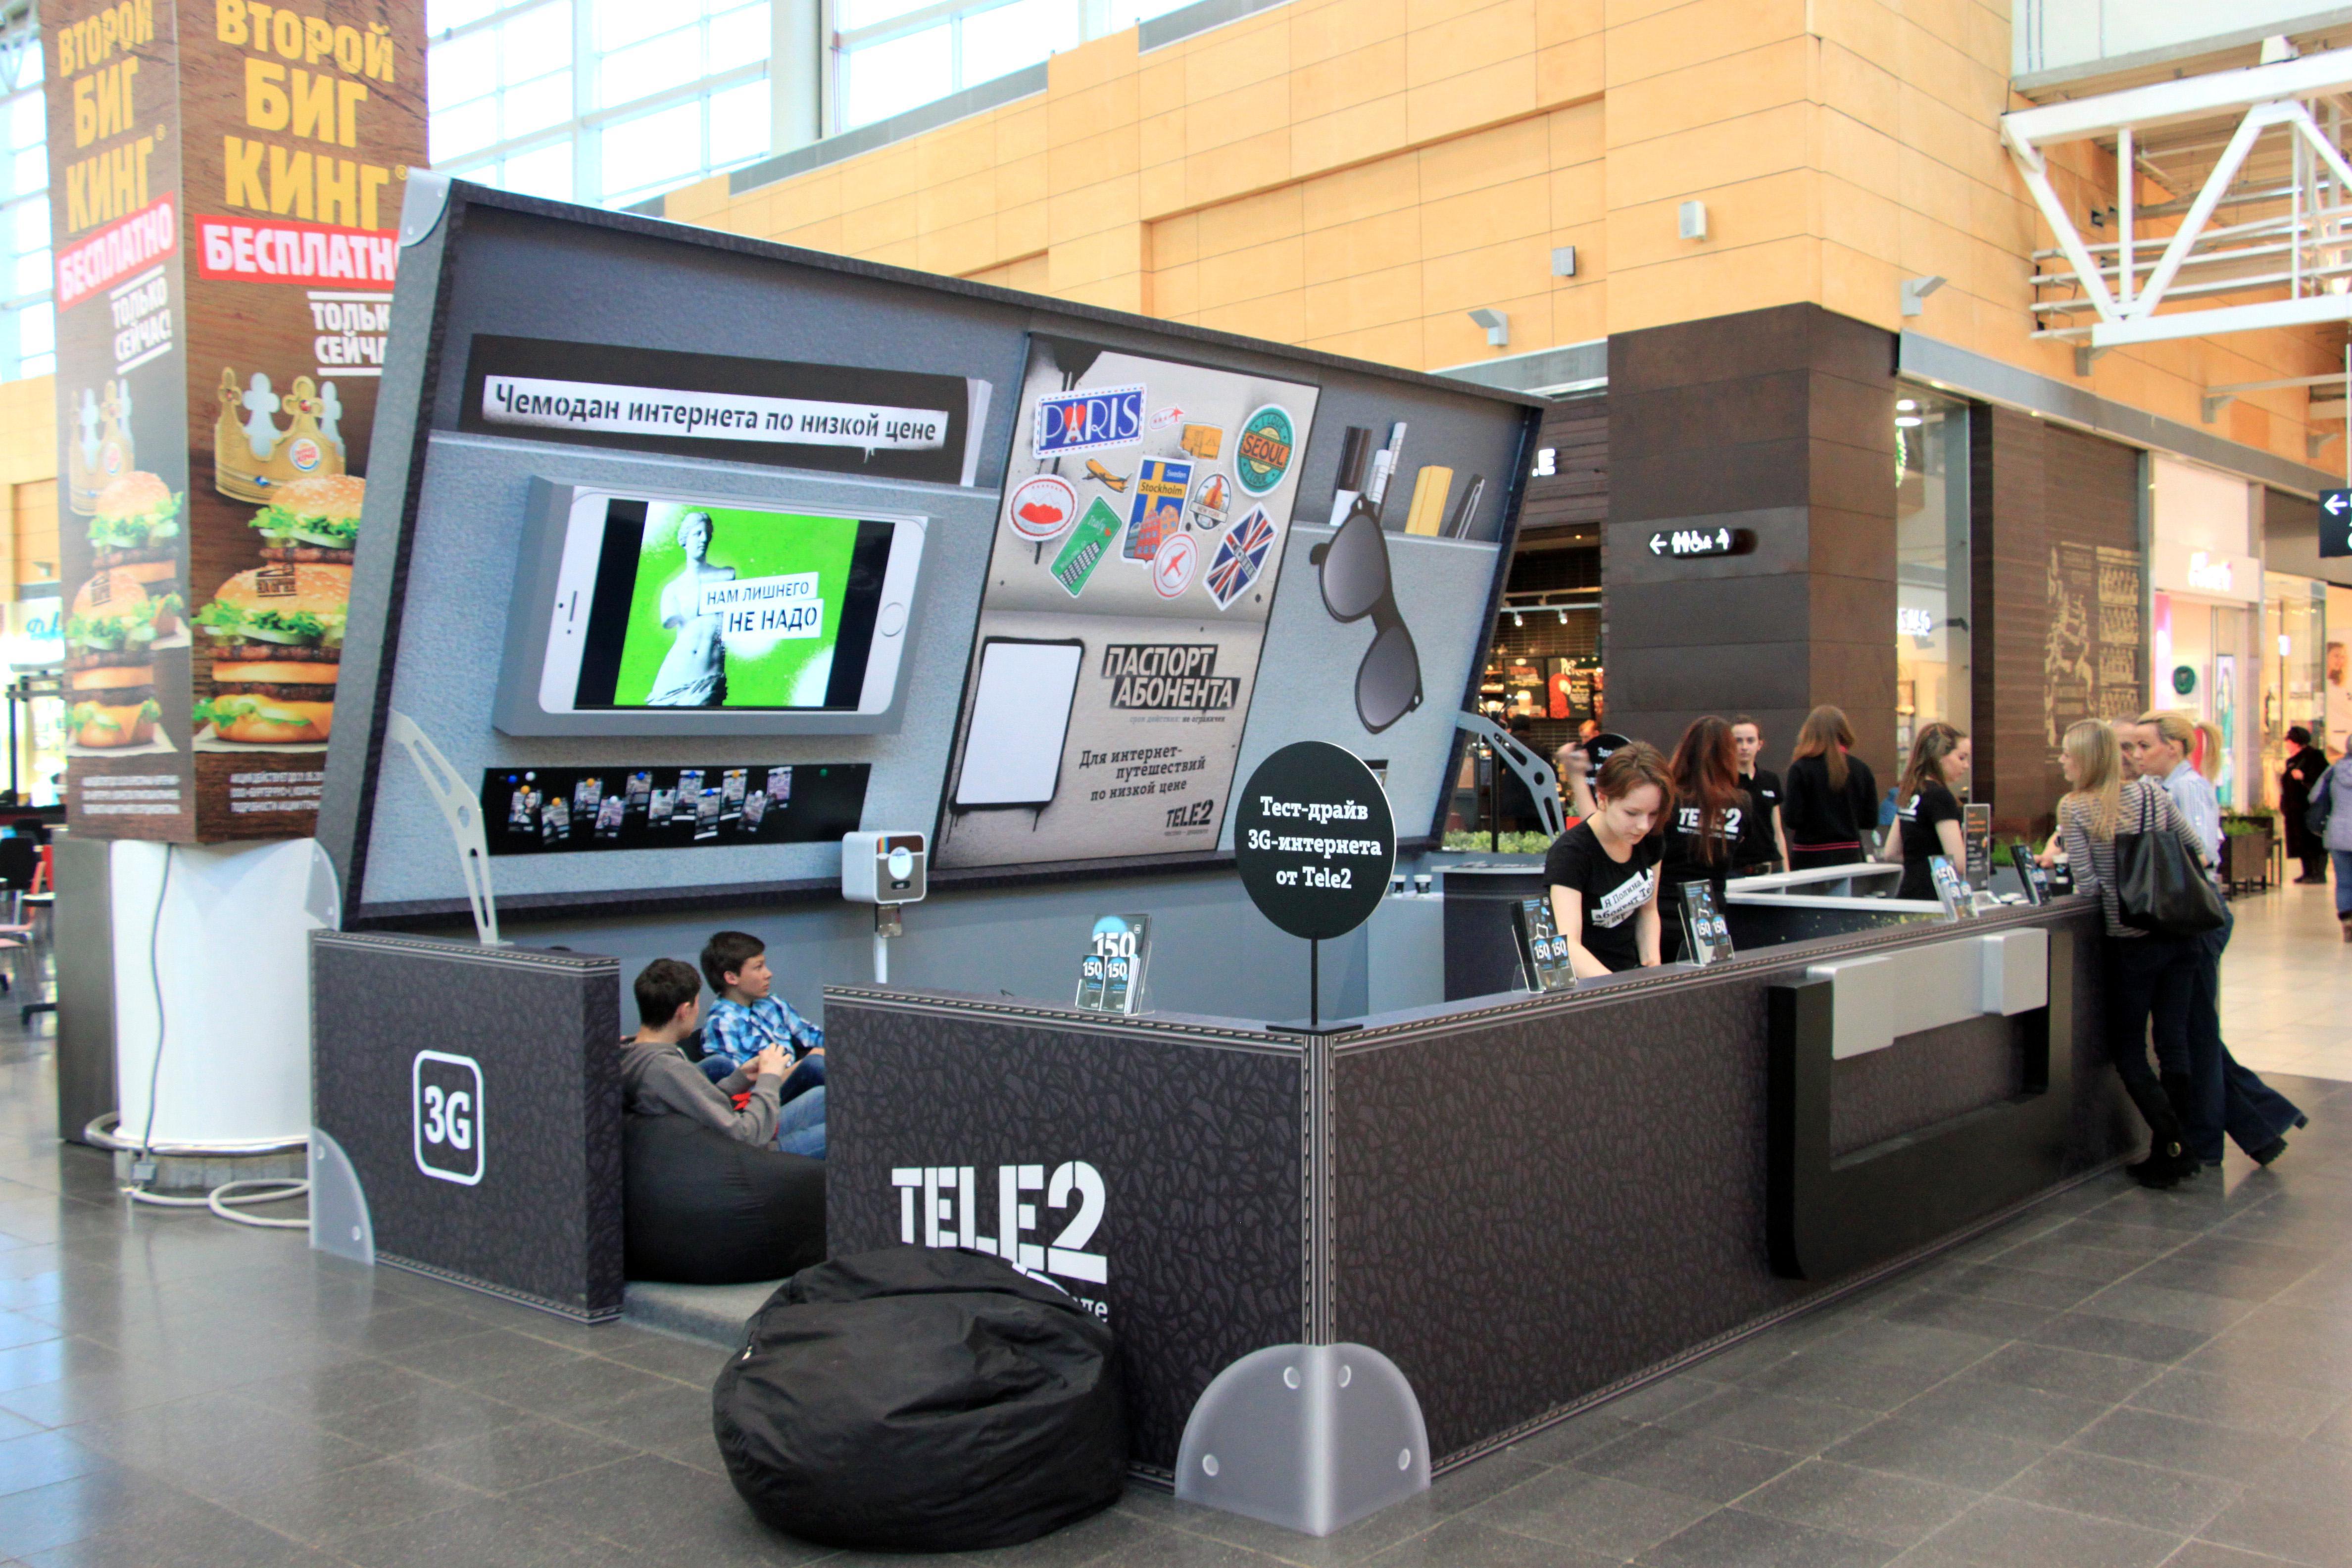 Теле2 чемодан интернета: услуга, проверить остаток трафика